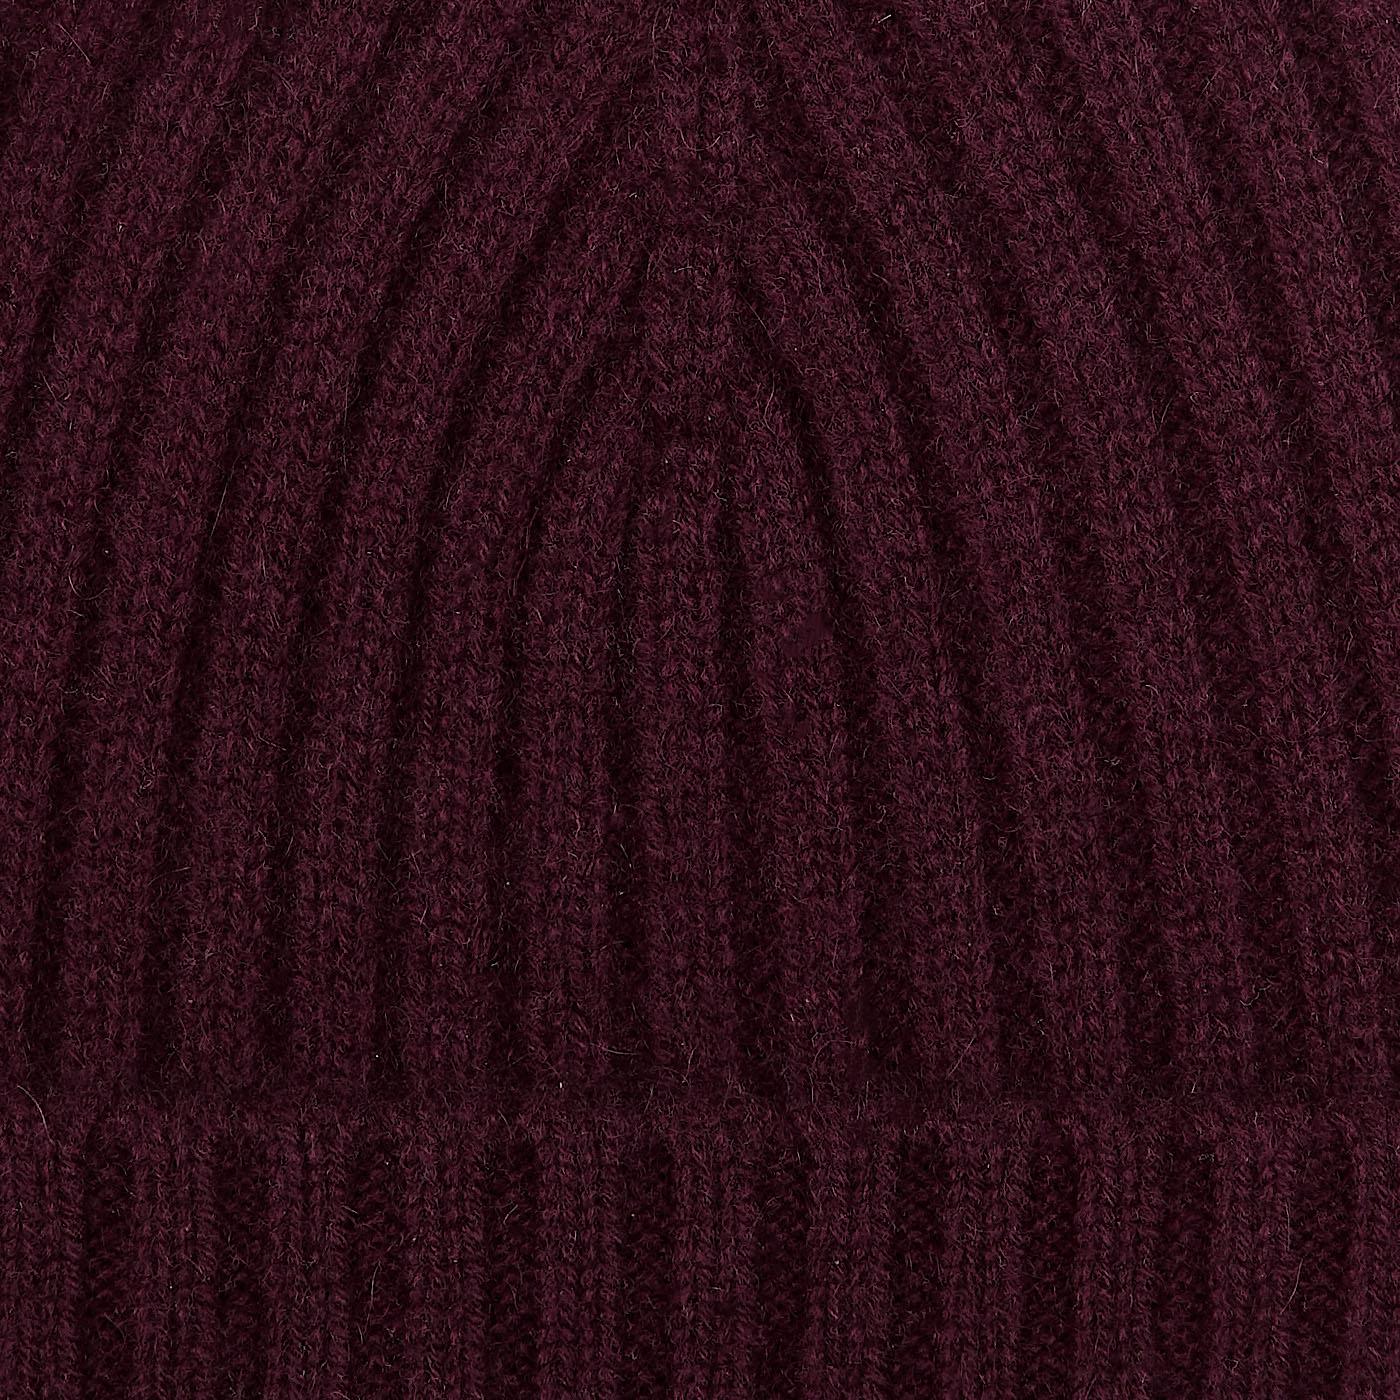 Amanda Christensen Burgundy Ribbed Cashmere Cap Fabric